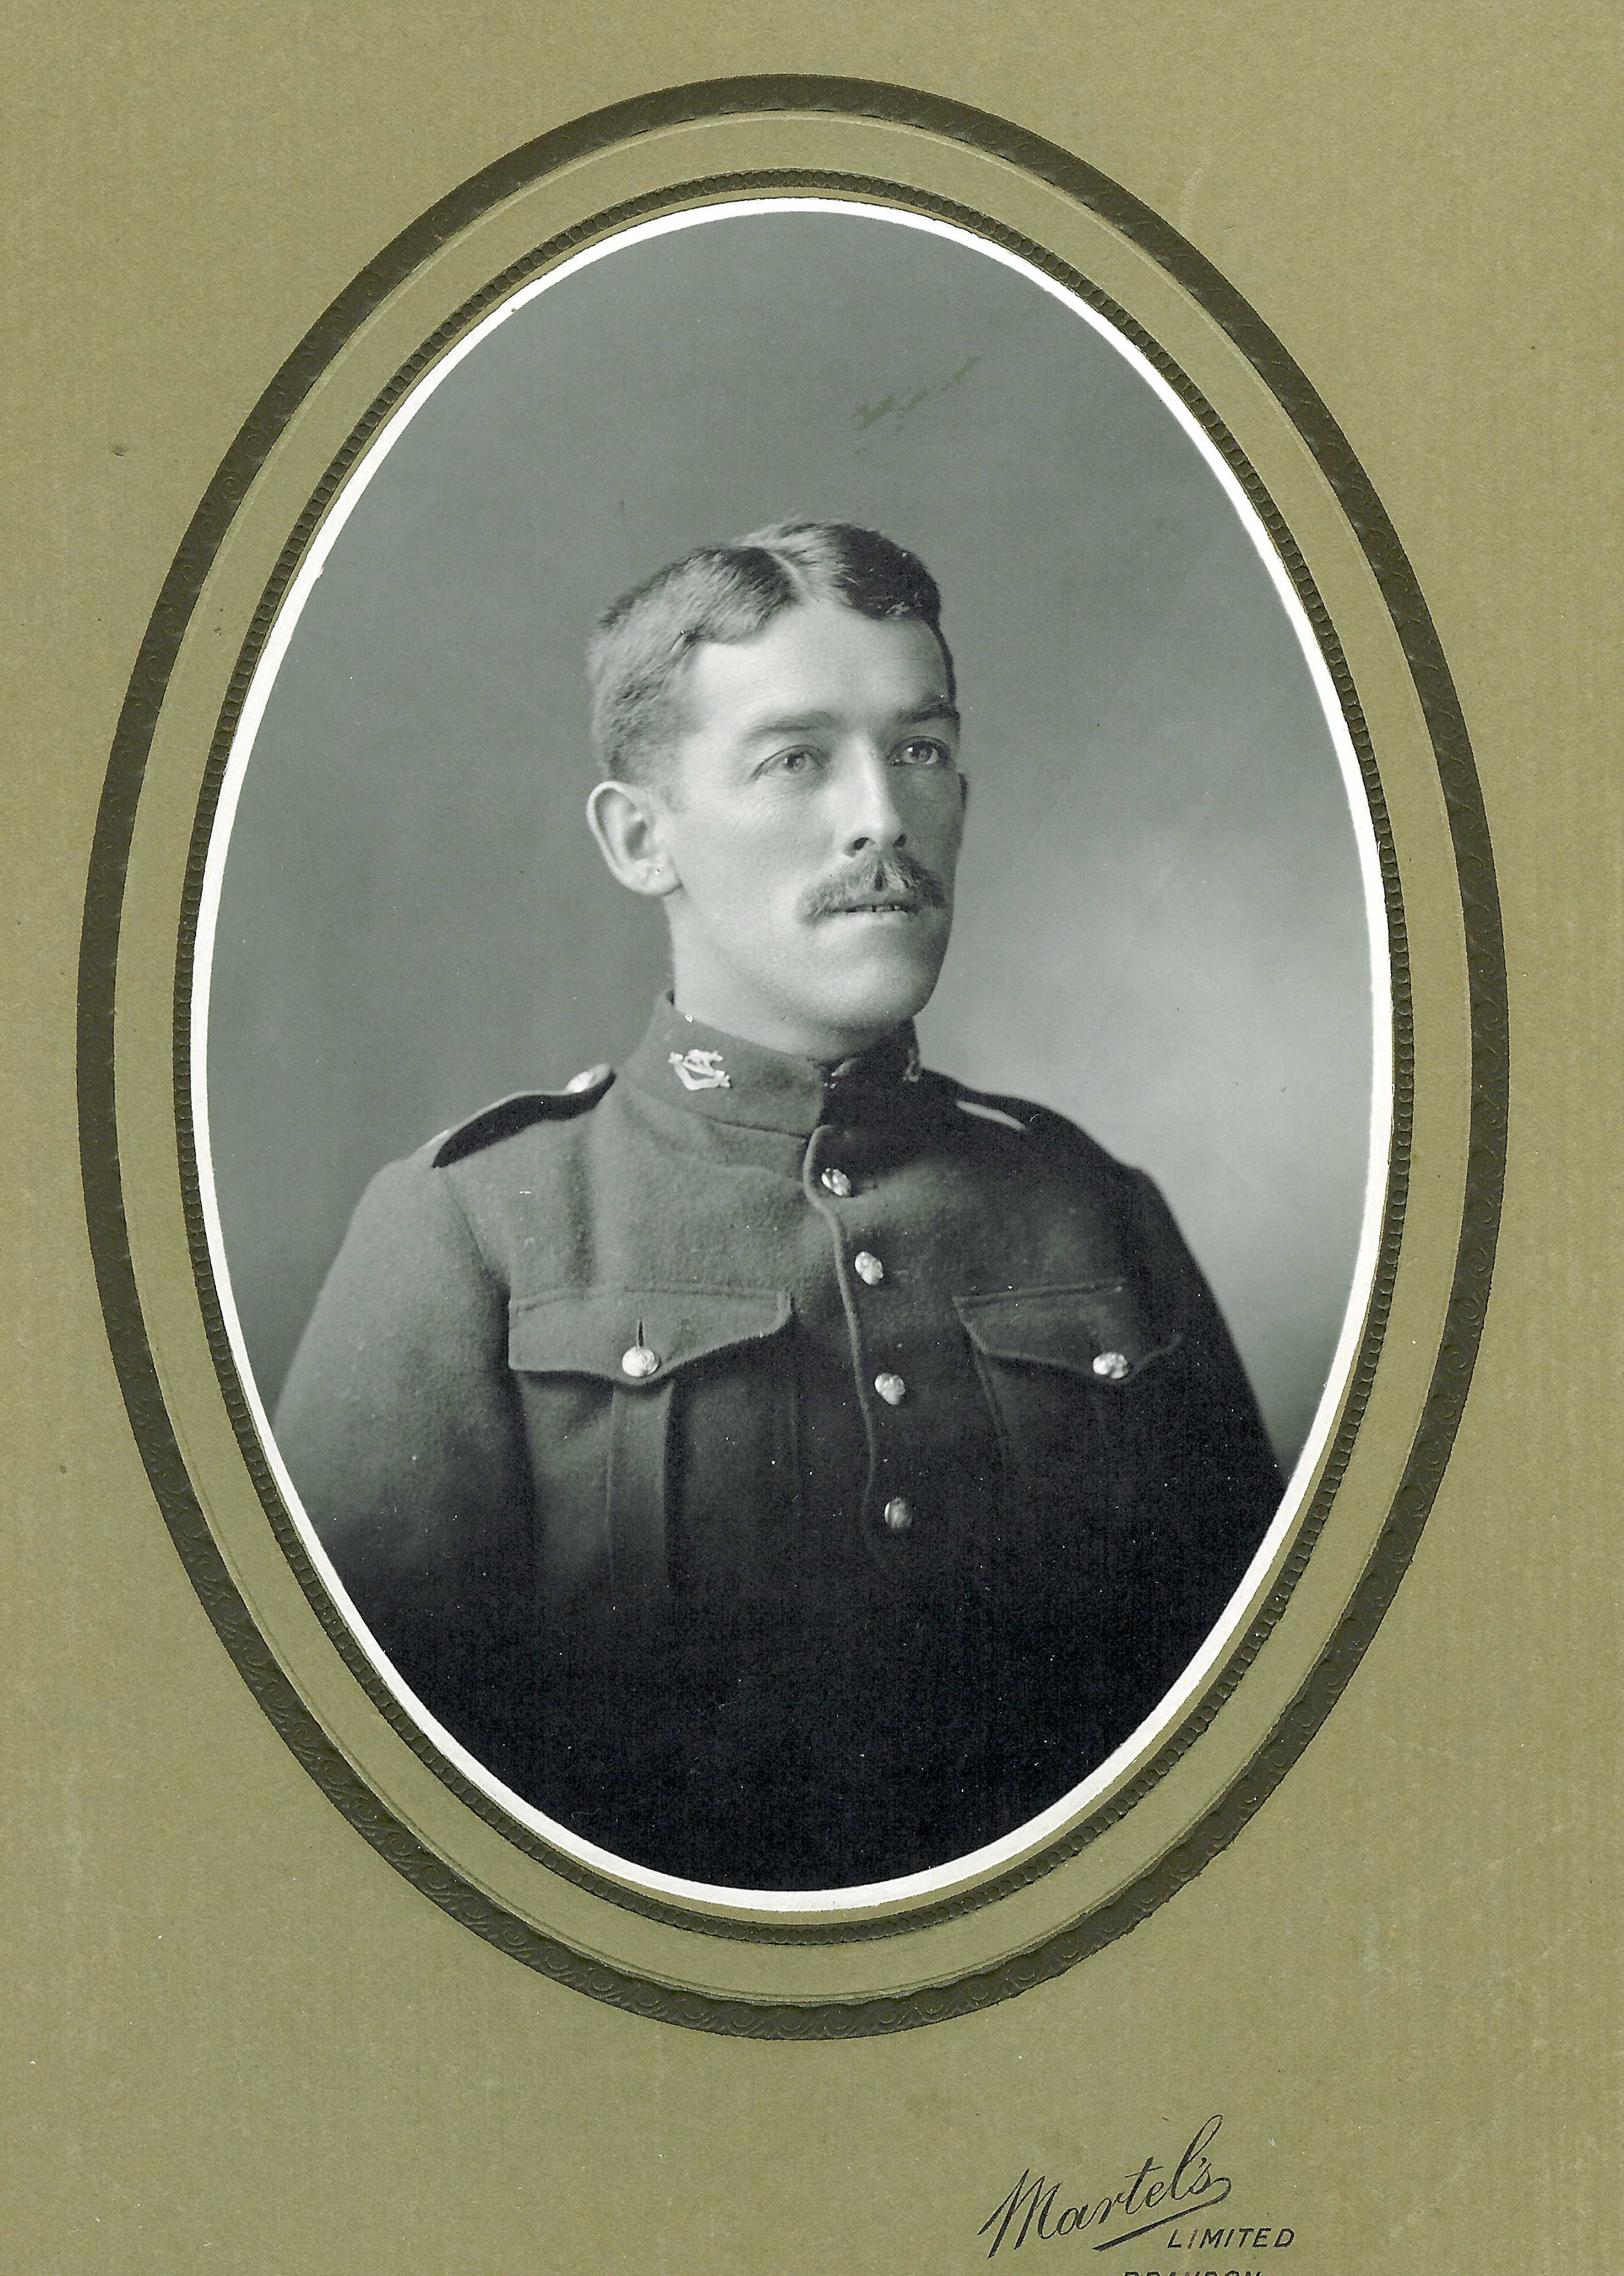 Photo of RICHARD HALLAM– Richard Hallam in uniform- son of Isaac and Elizabeth Hallam